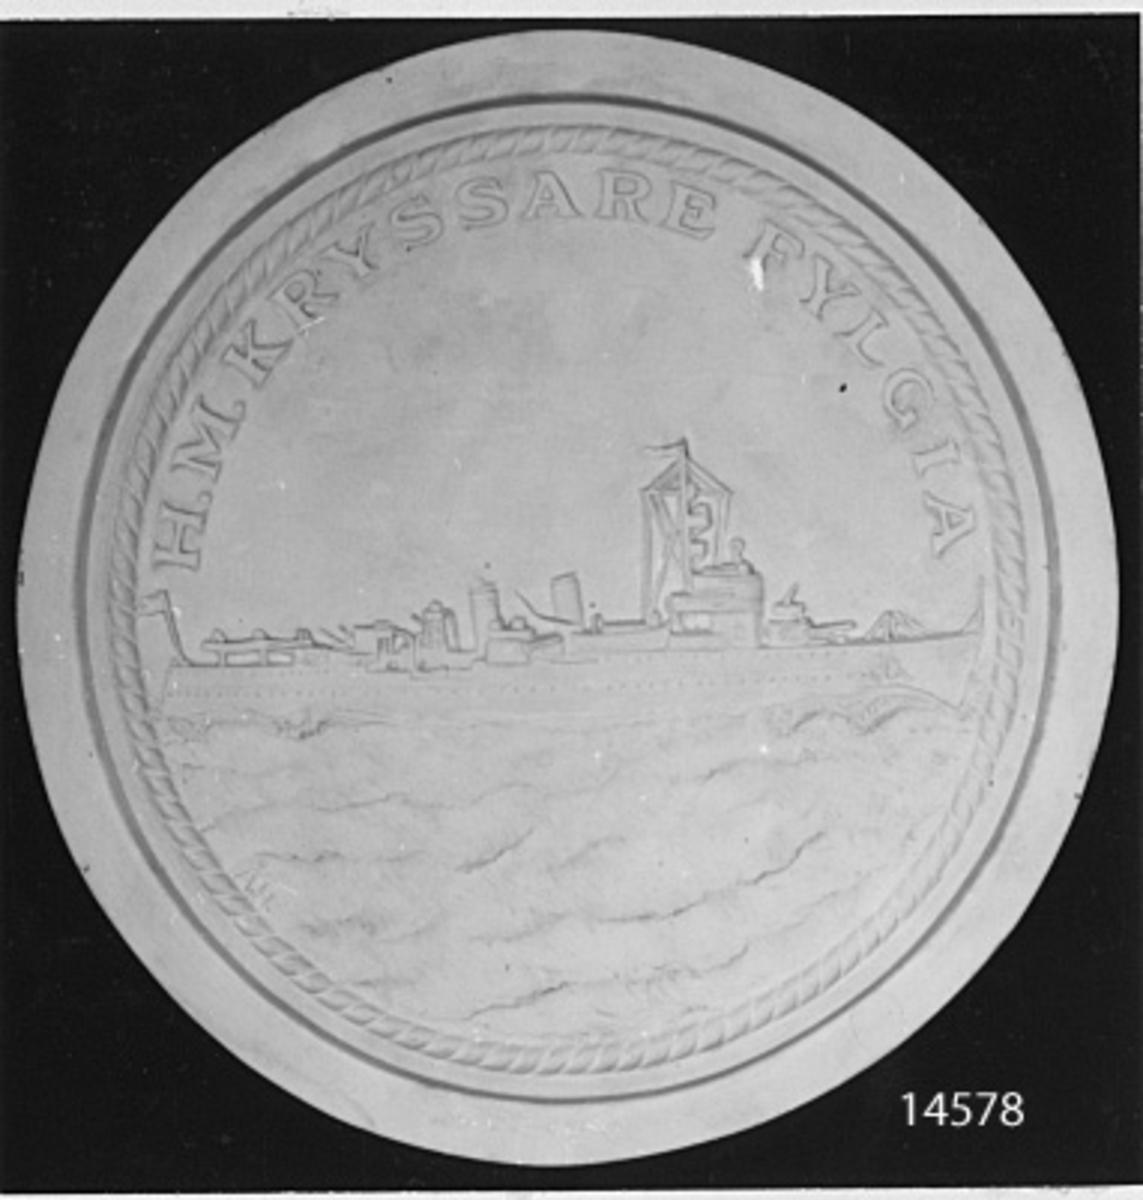 Minnespenning. Originalmodell. På framsidan: Kryssaren Fylgia. Text: HM Kryssaren Fylgia.